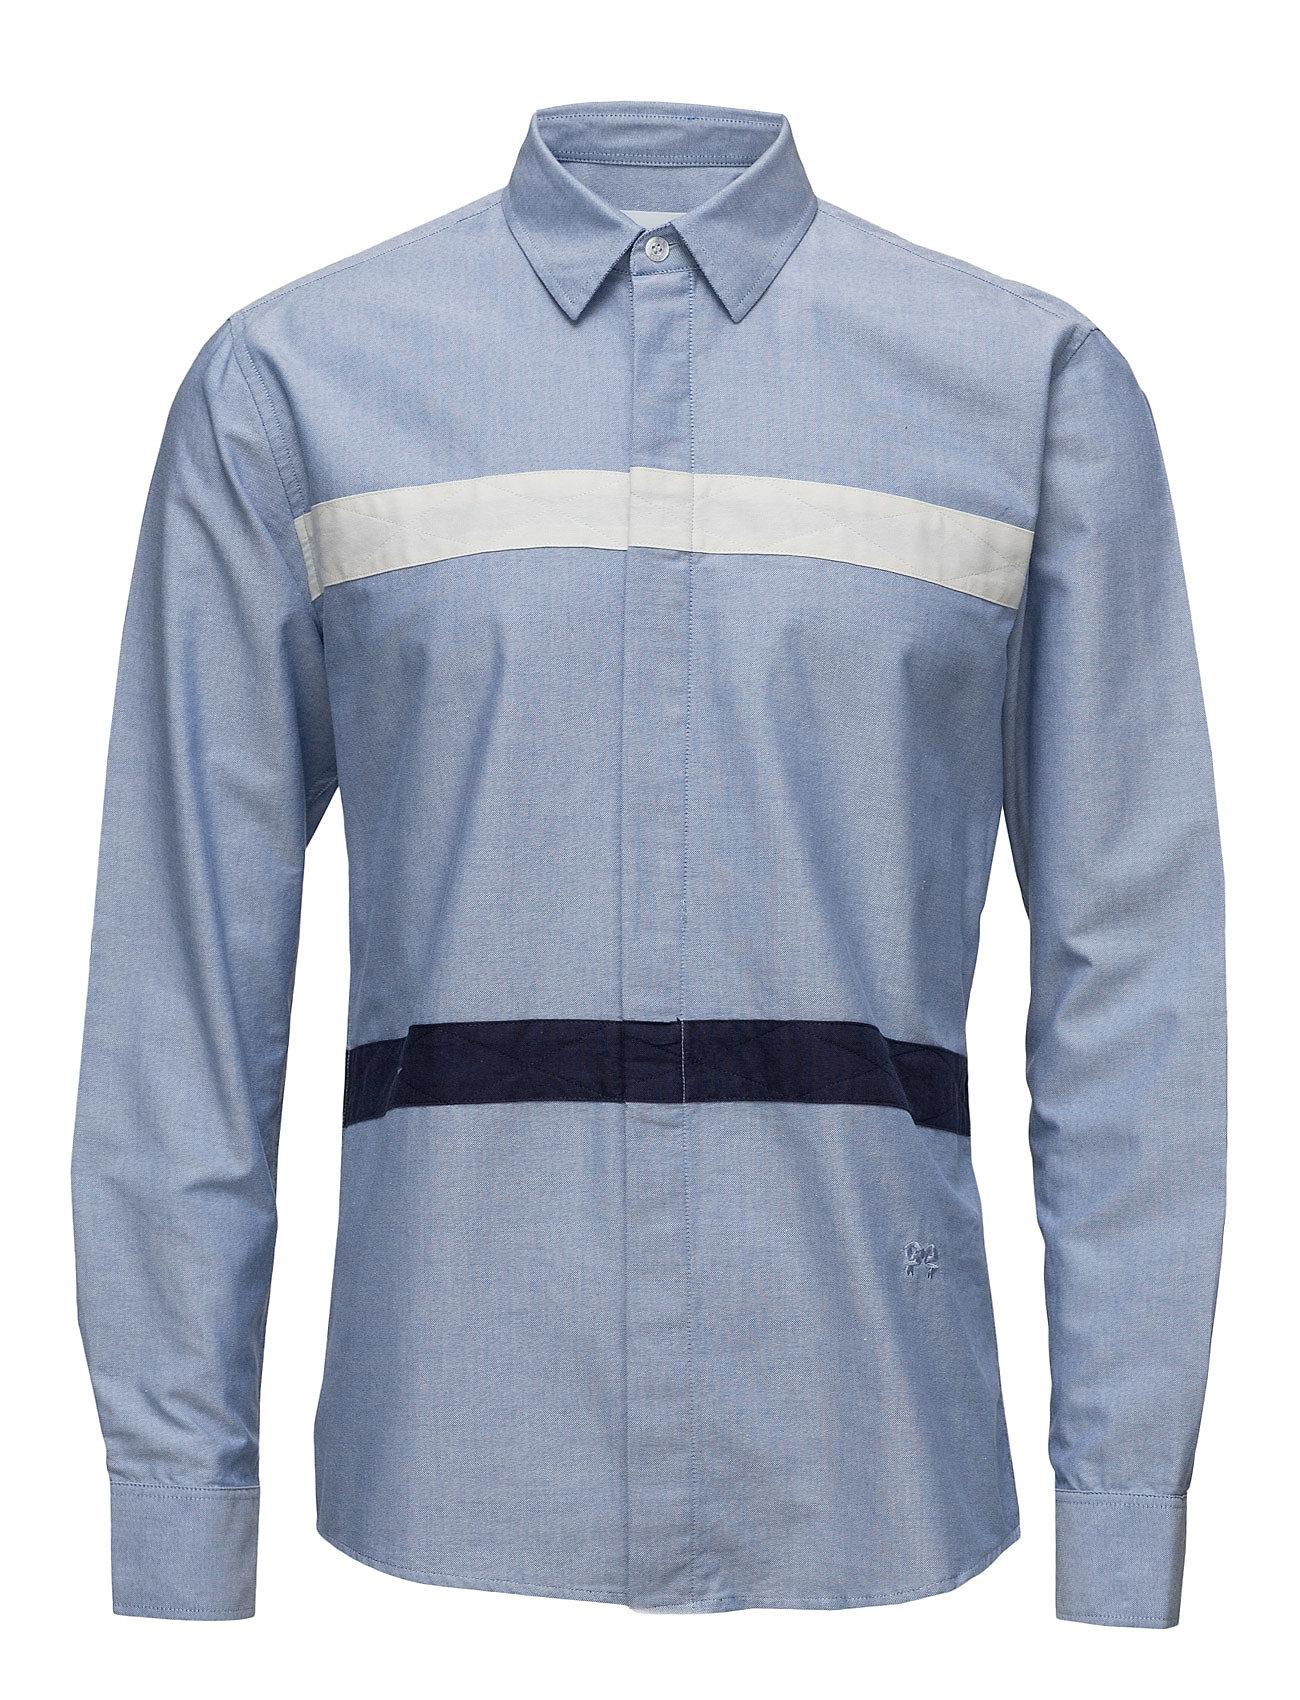 Ss17 Asklund Shirt W. Stitched Fabric Tapes Soulland Casual sko til Herrer i